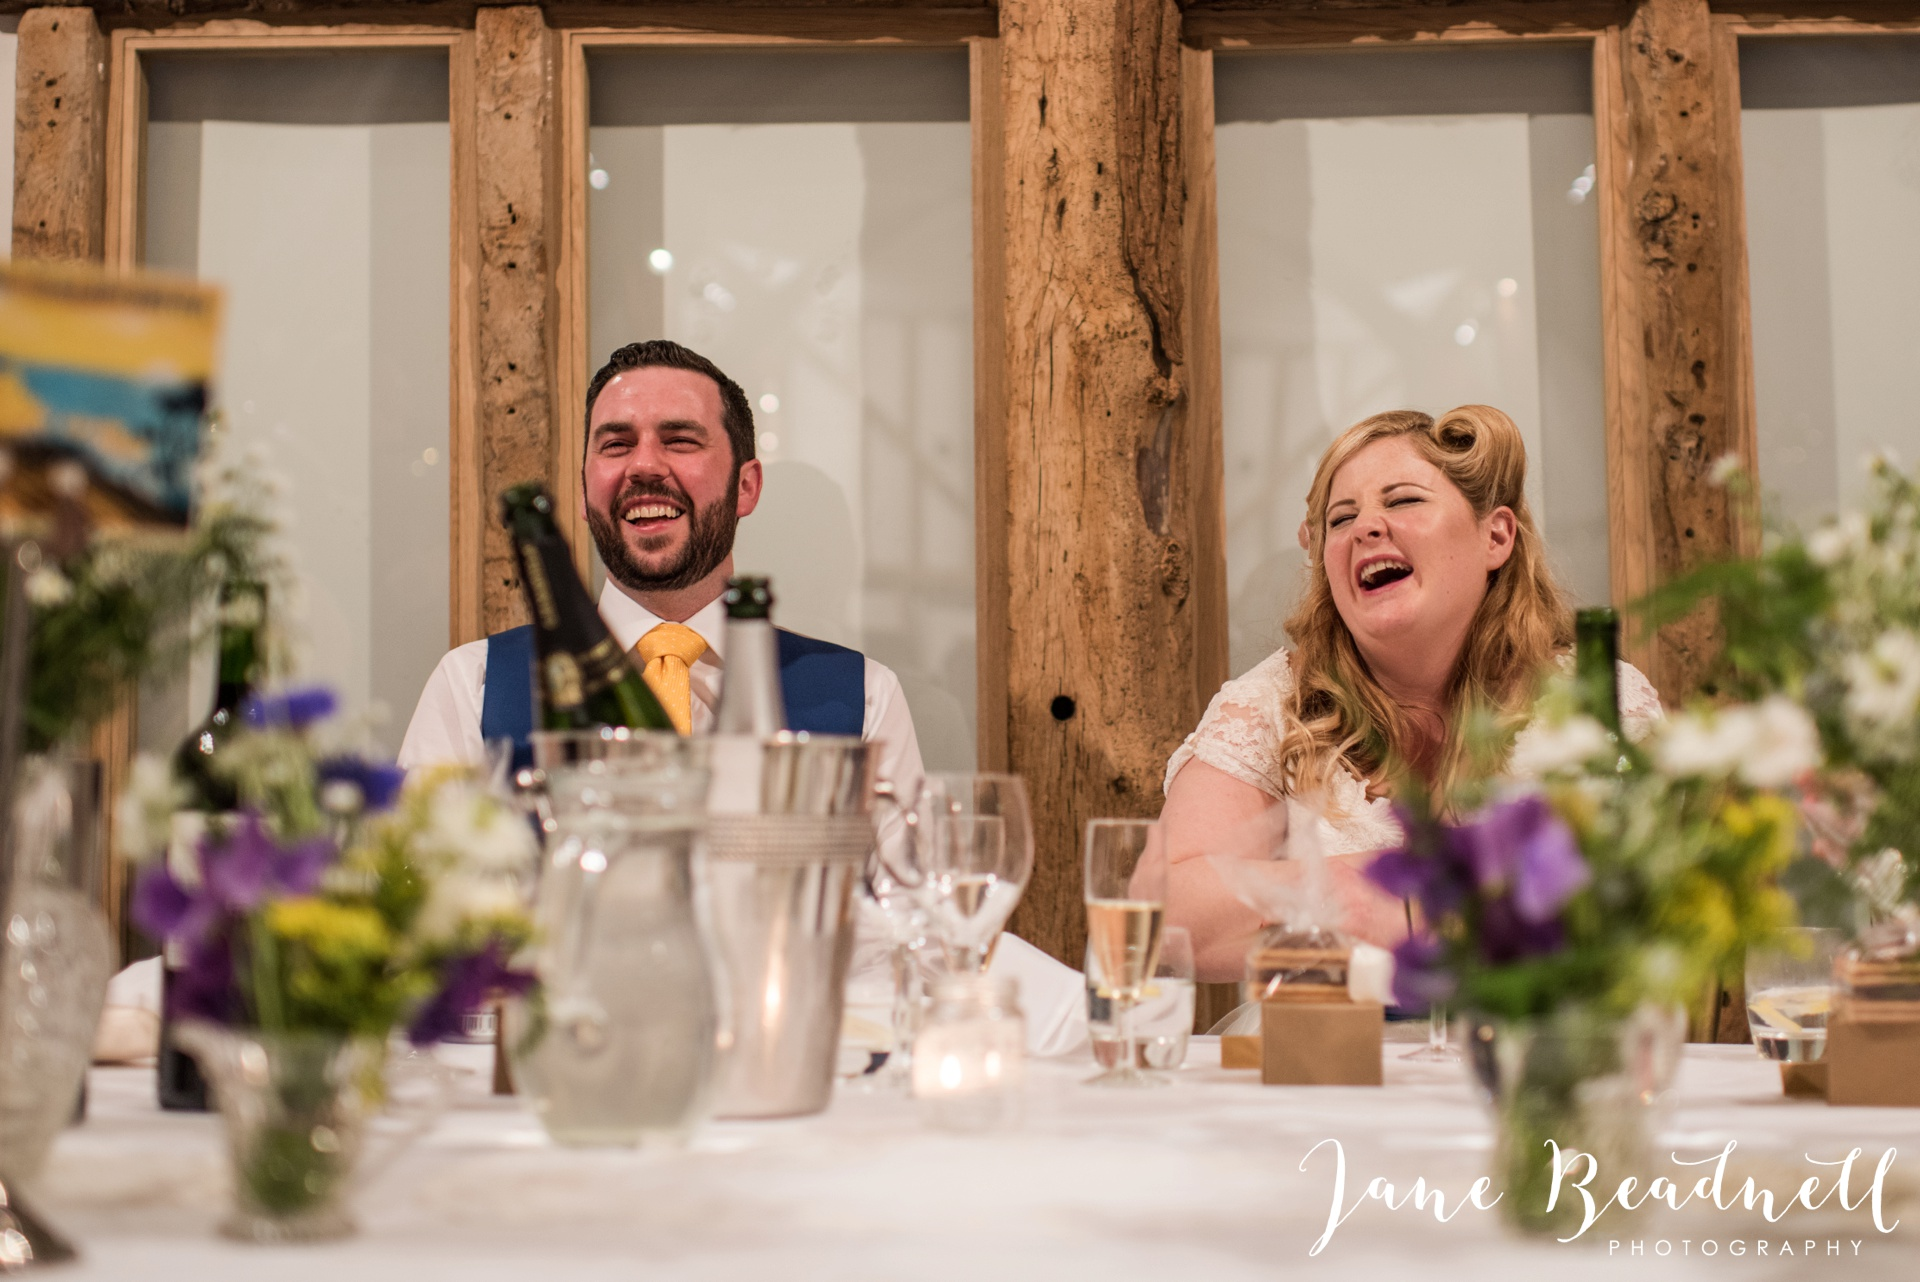 South Farm Wedding photography Hertfordshire by Jane Beadnell Photography fine art wedding photographer_0208